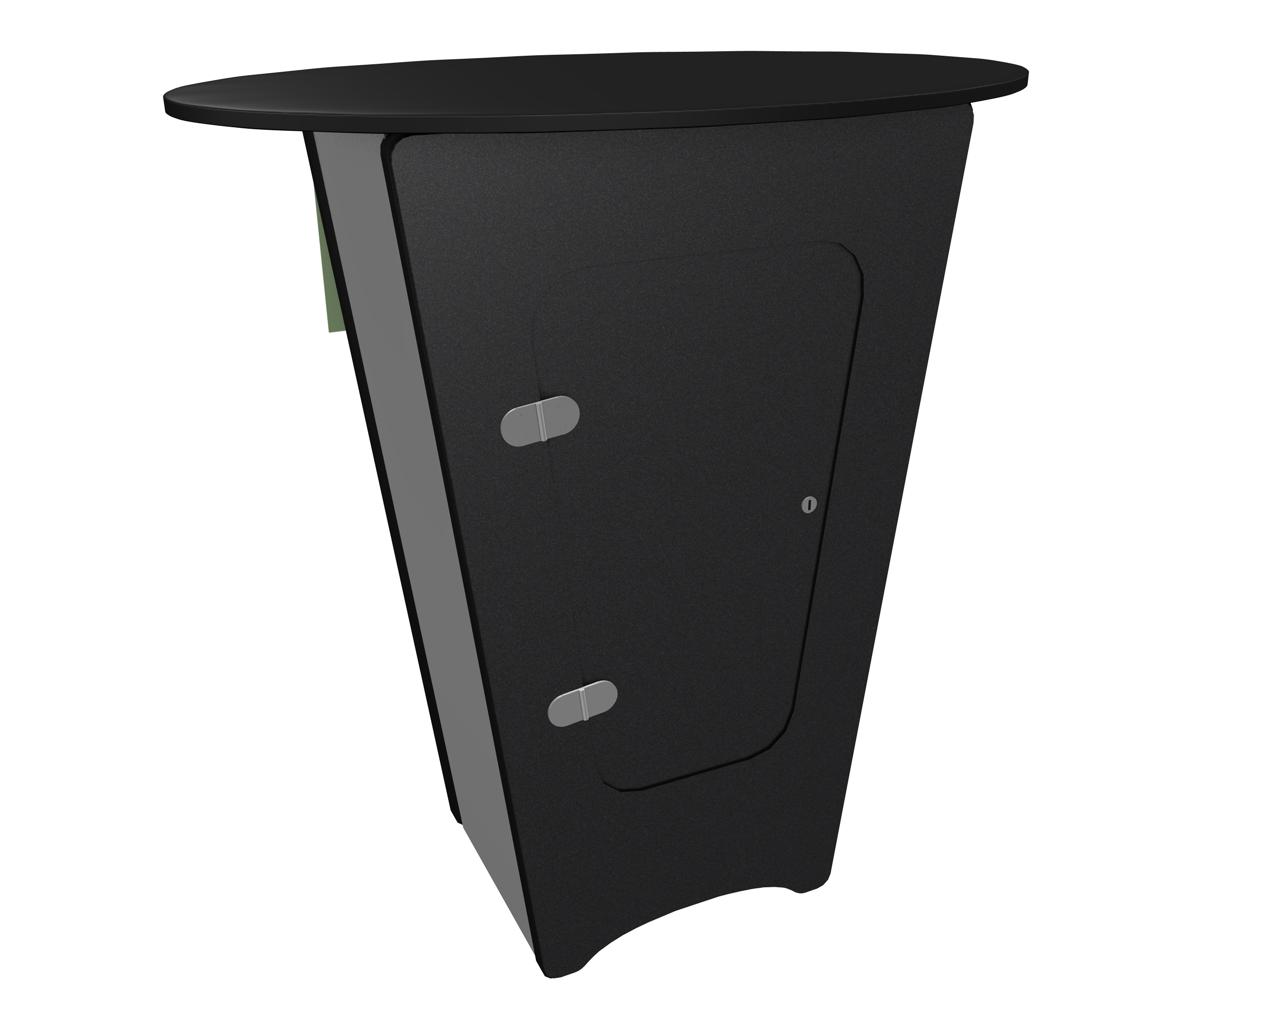 XVline NLC1.SG1 Locking Counter